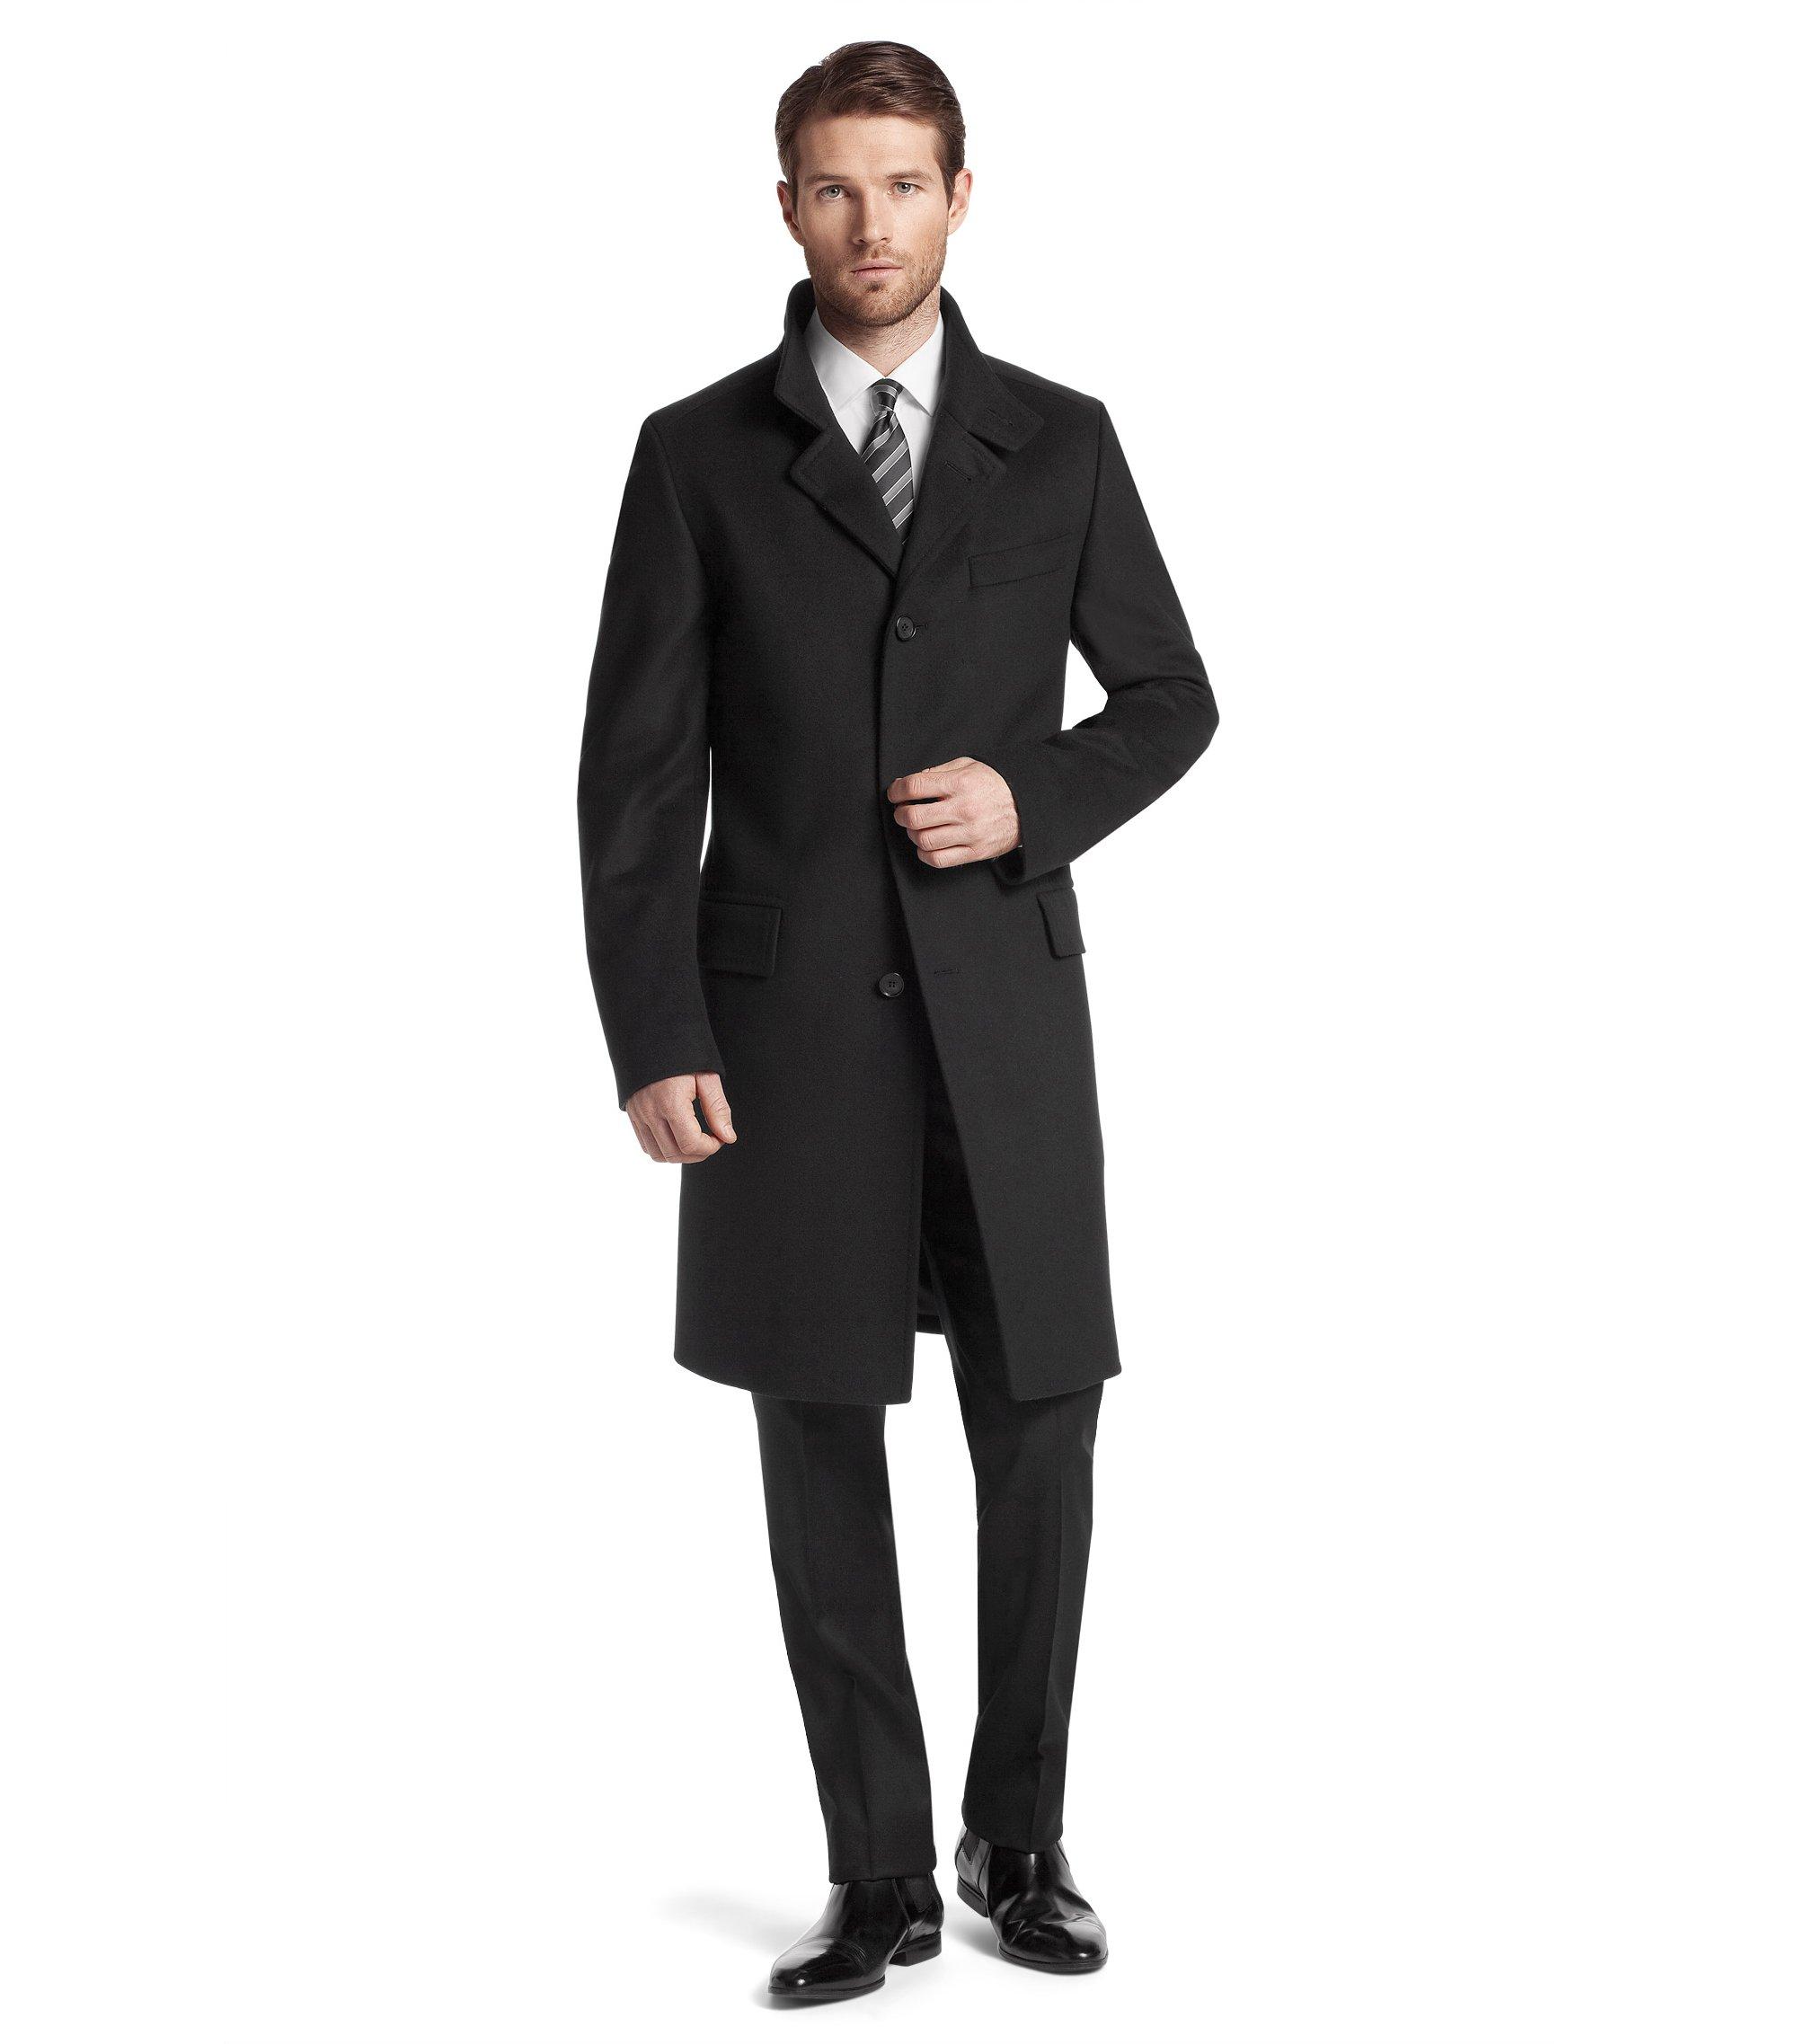 New wool blend coat by BOSS Black 'The Sintrax', Black